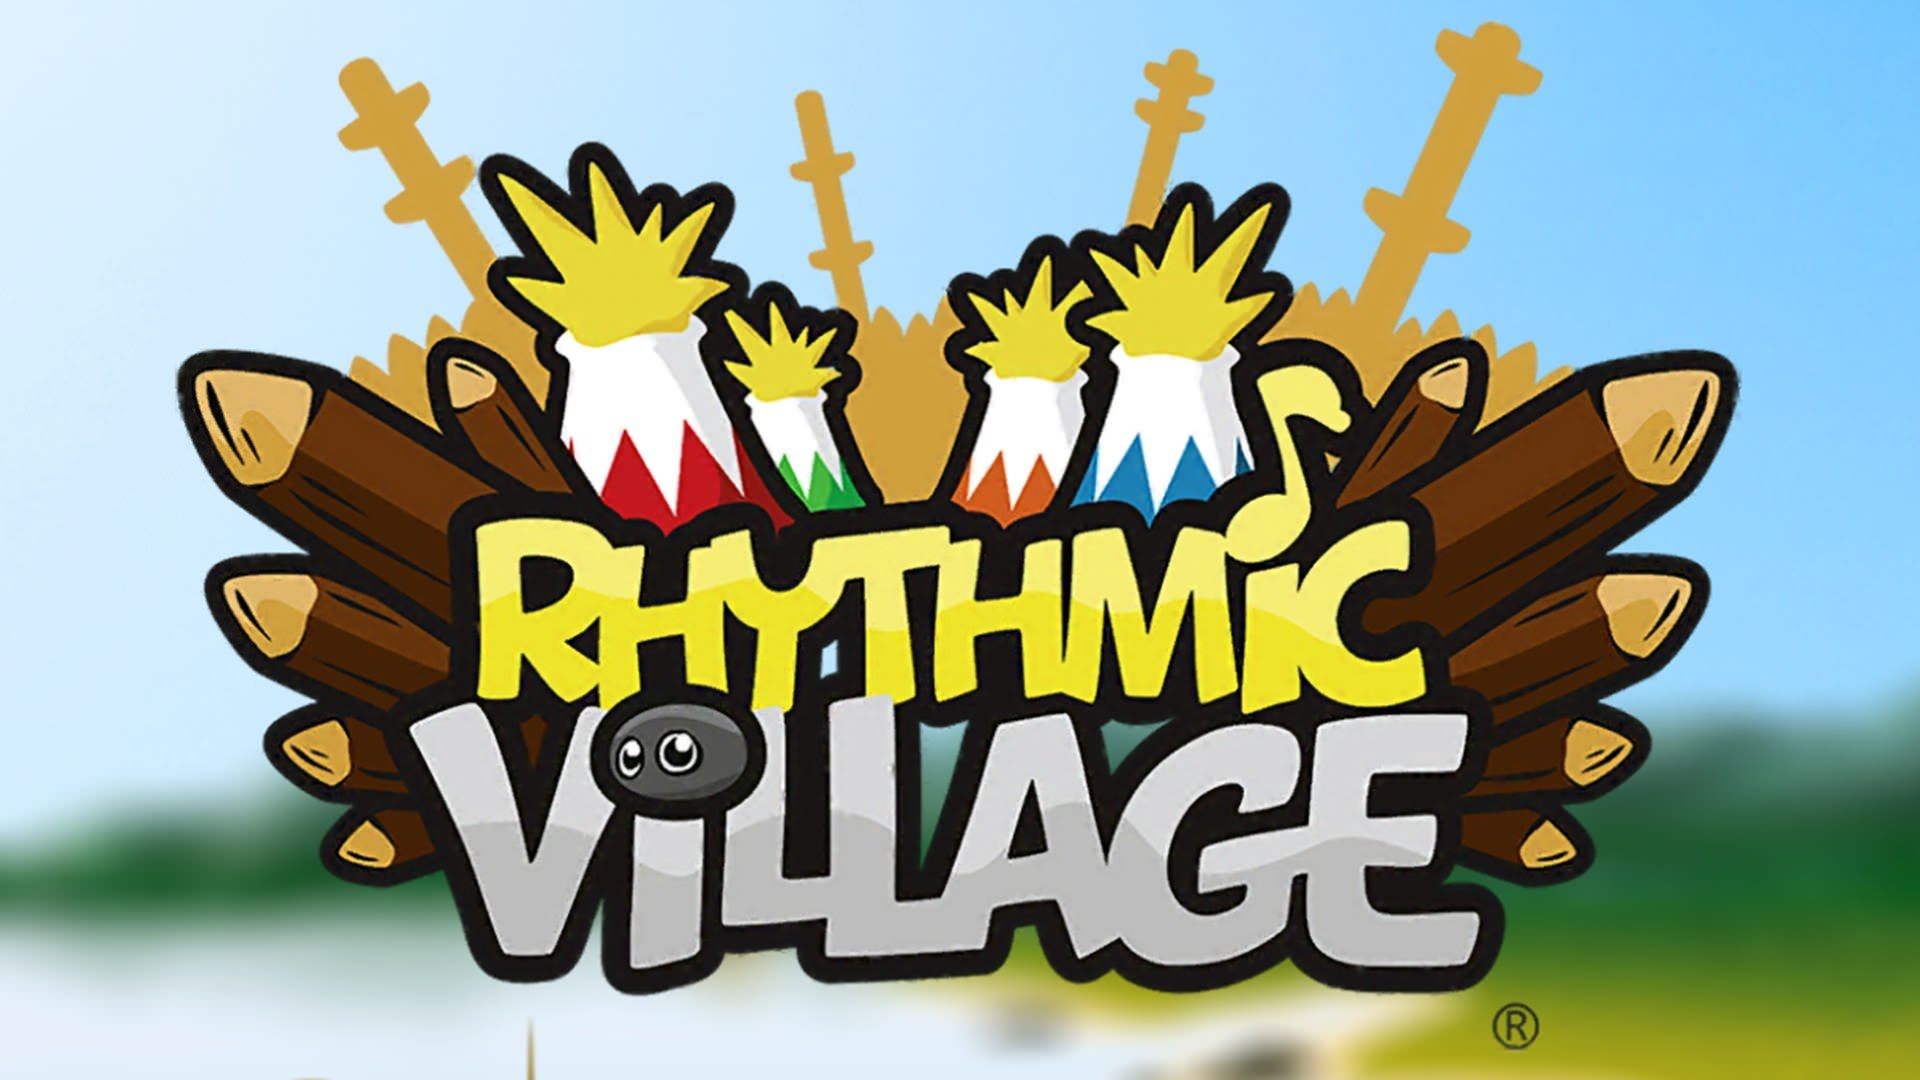 Oratio Rythmic Village